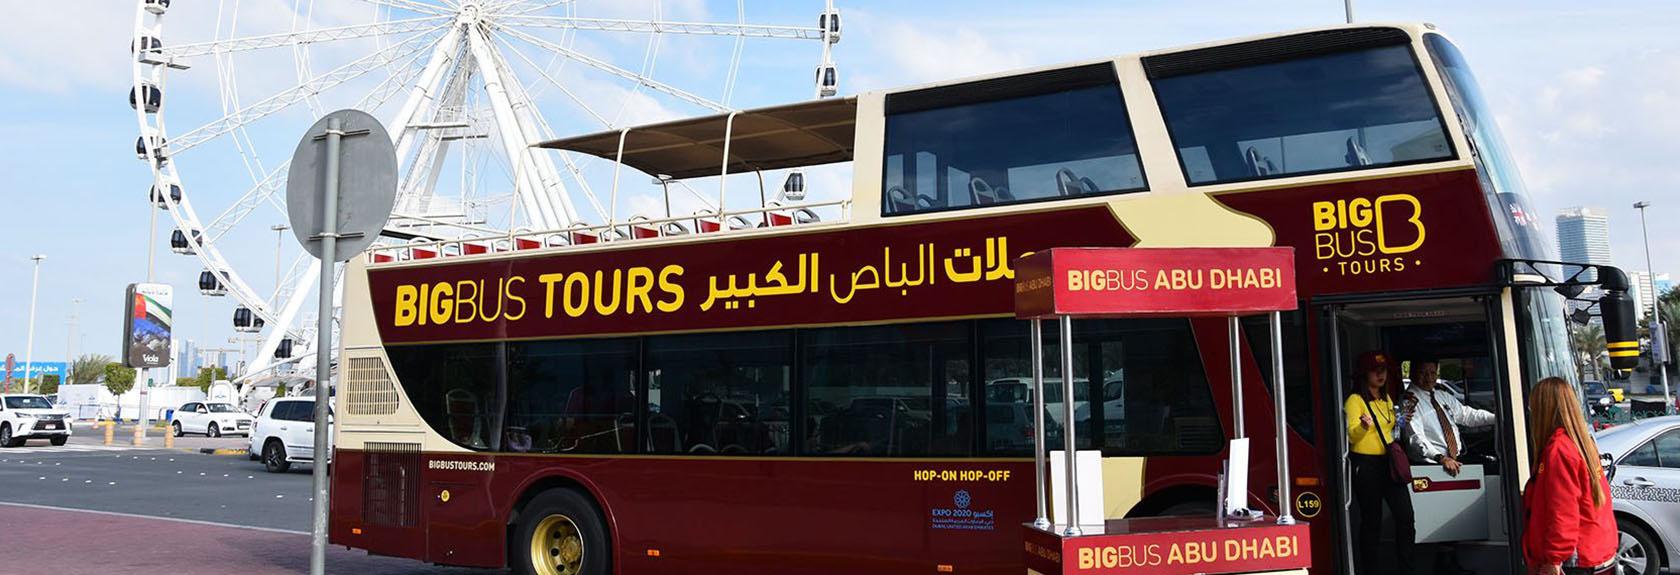 Abu Dhabi Big Bus Tours (Hop-on Hop-off Bus)